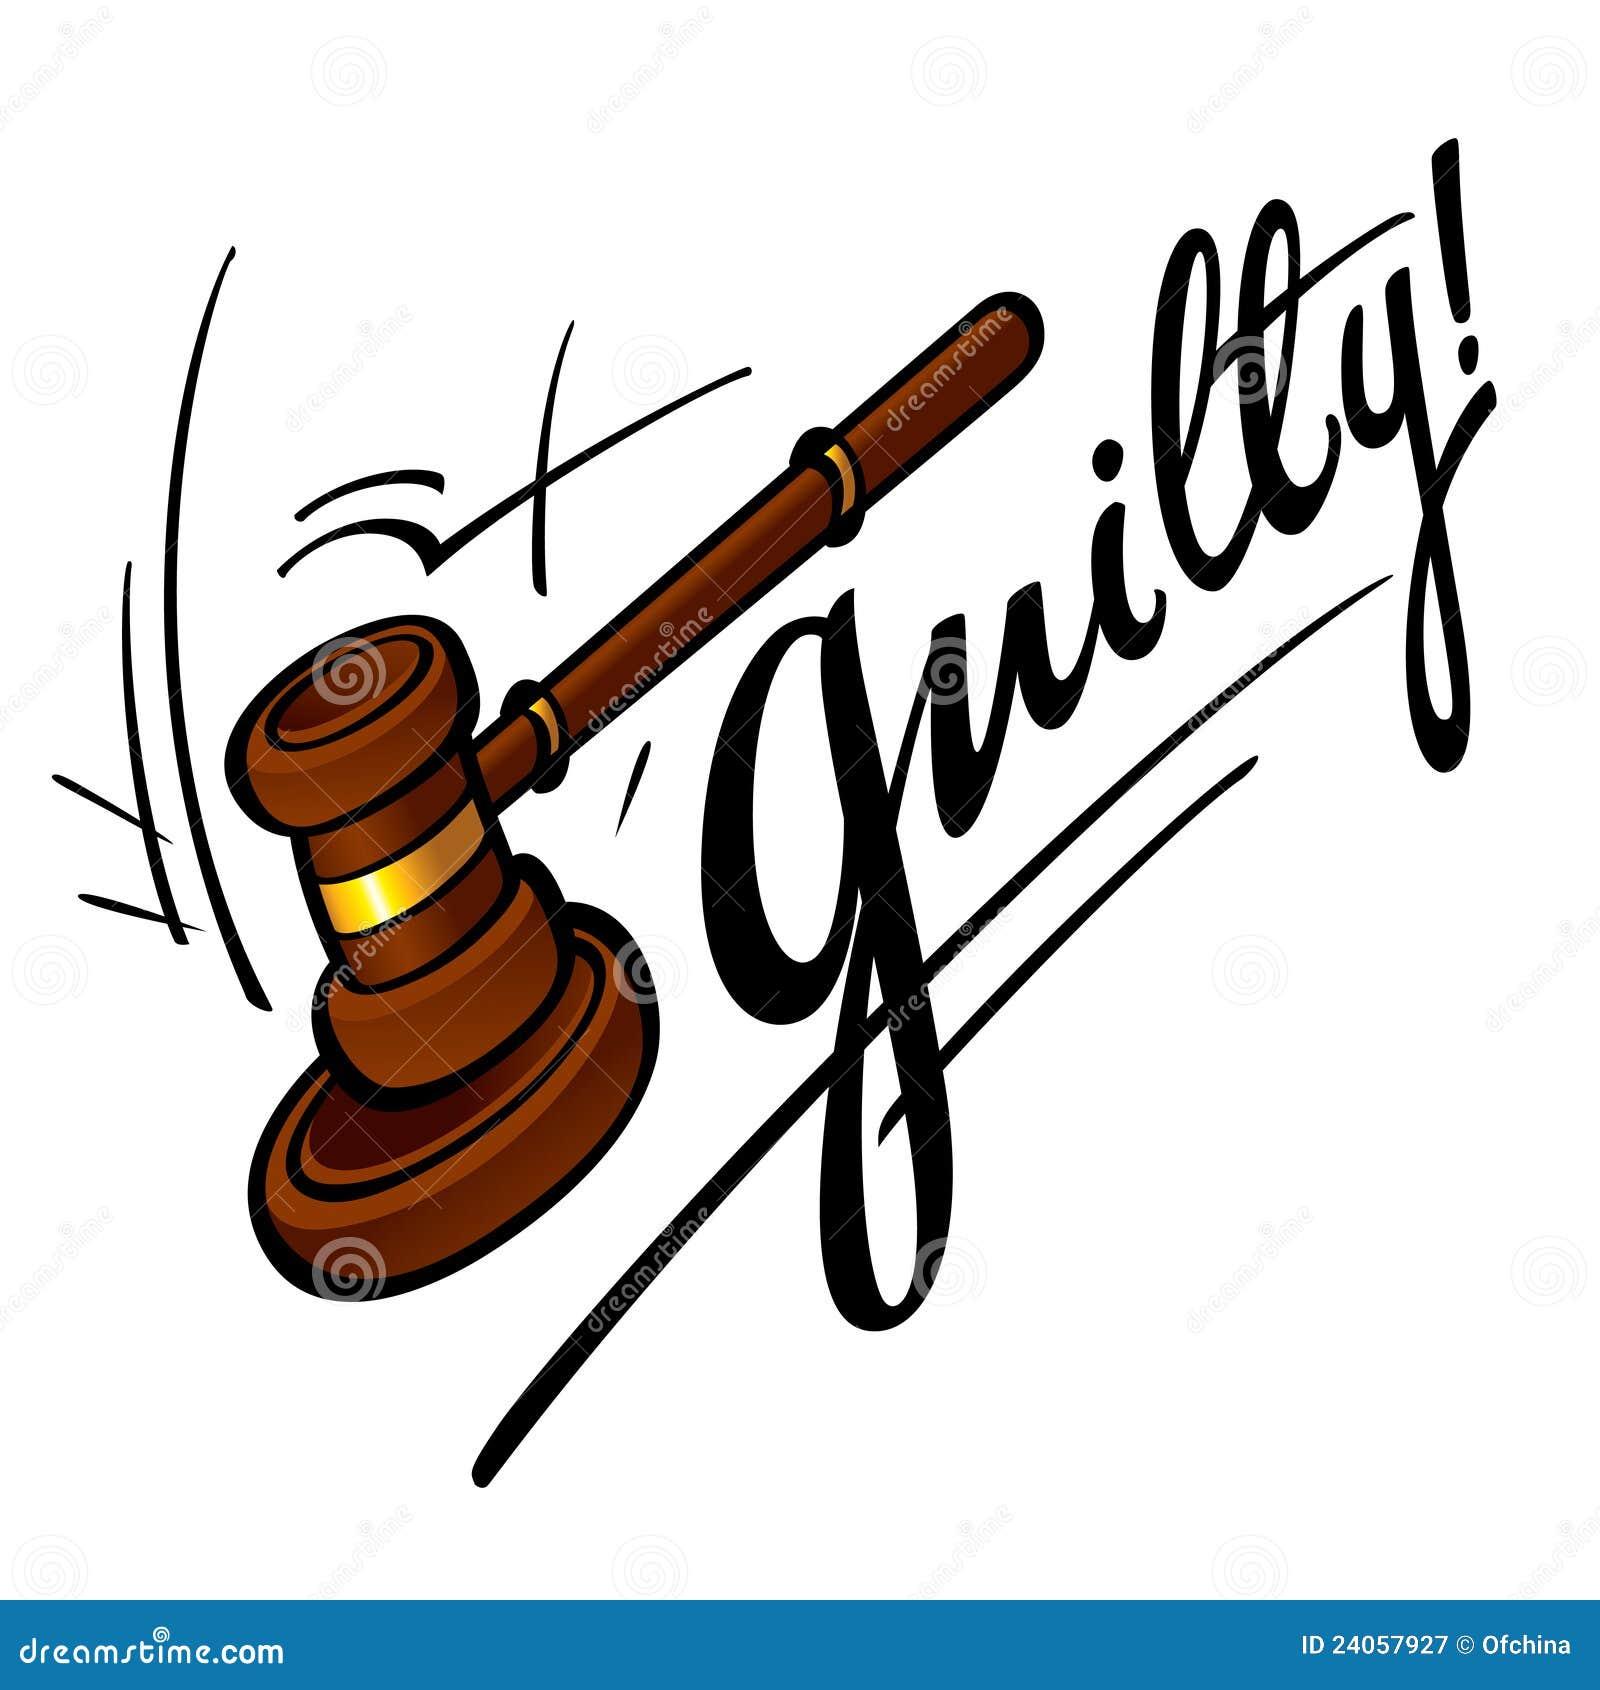 Guilty court judge wooden hammer crime sentence punishment.